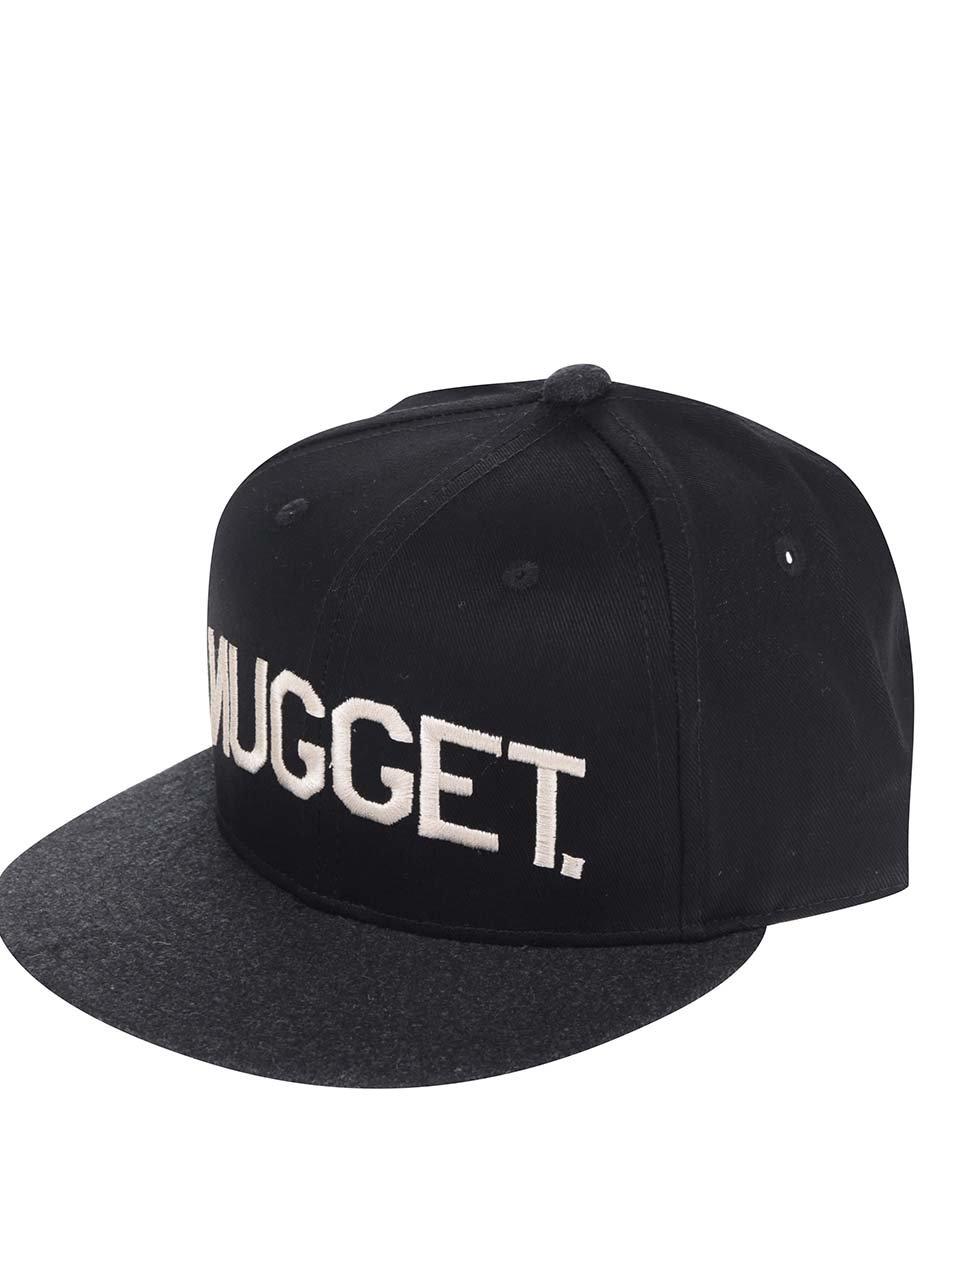 Černá pánská kšiltovka s rovným kšiltem NUGGET Grain